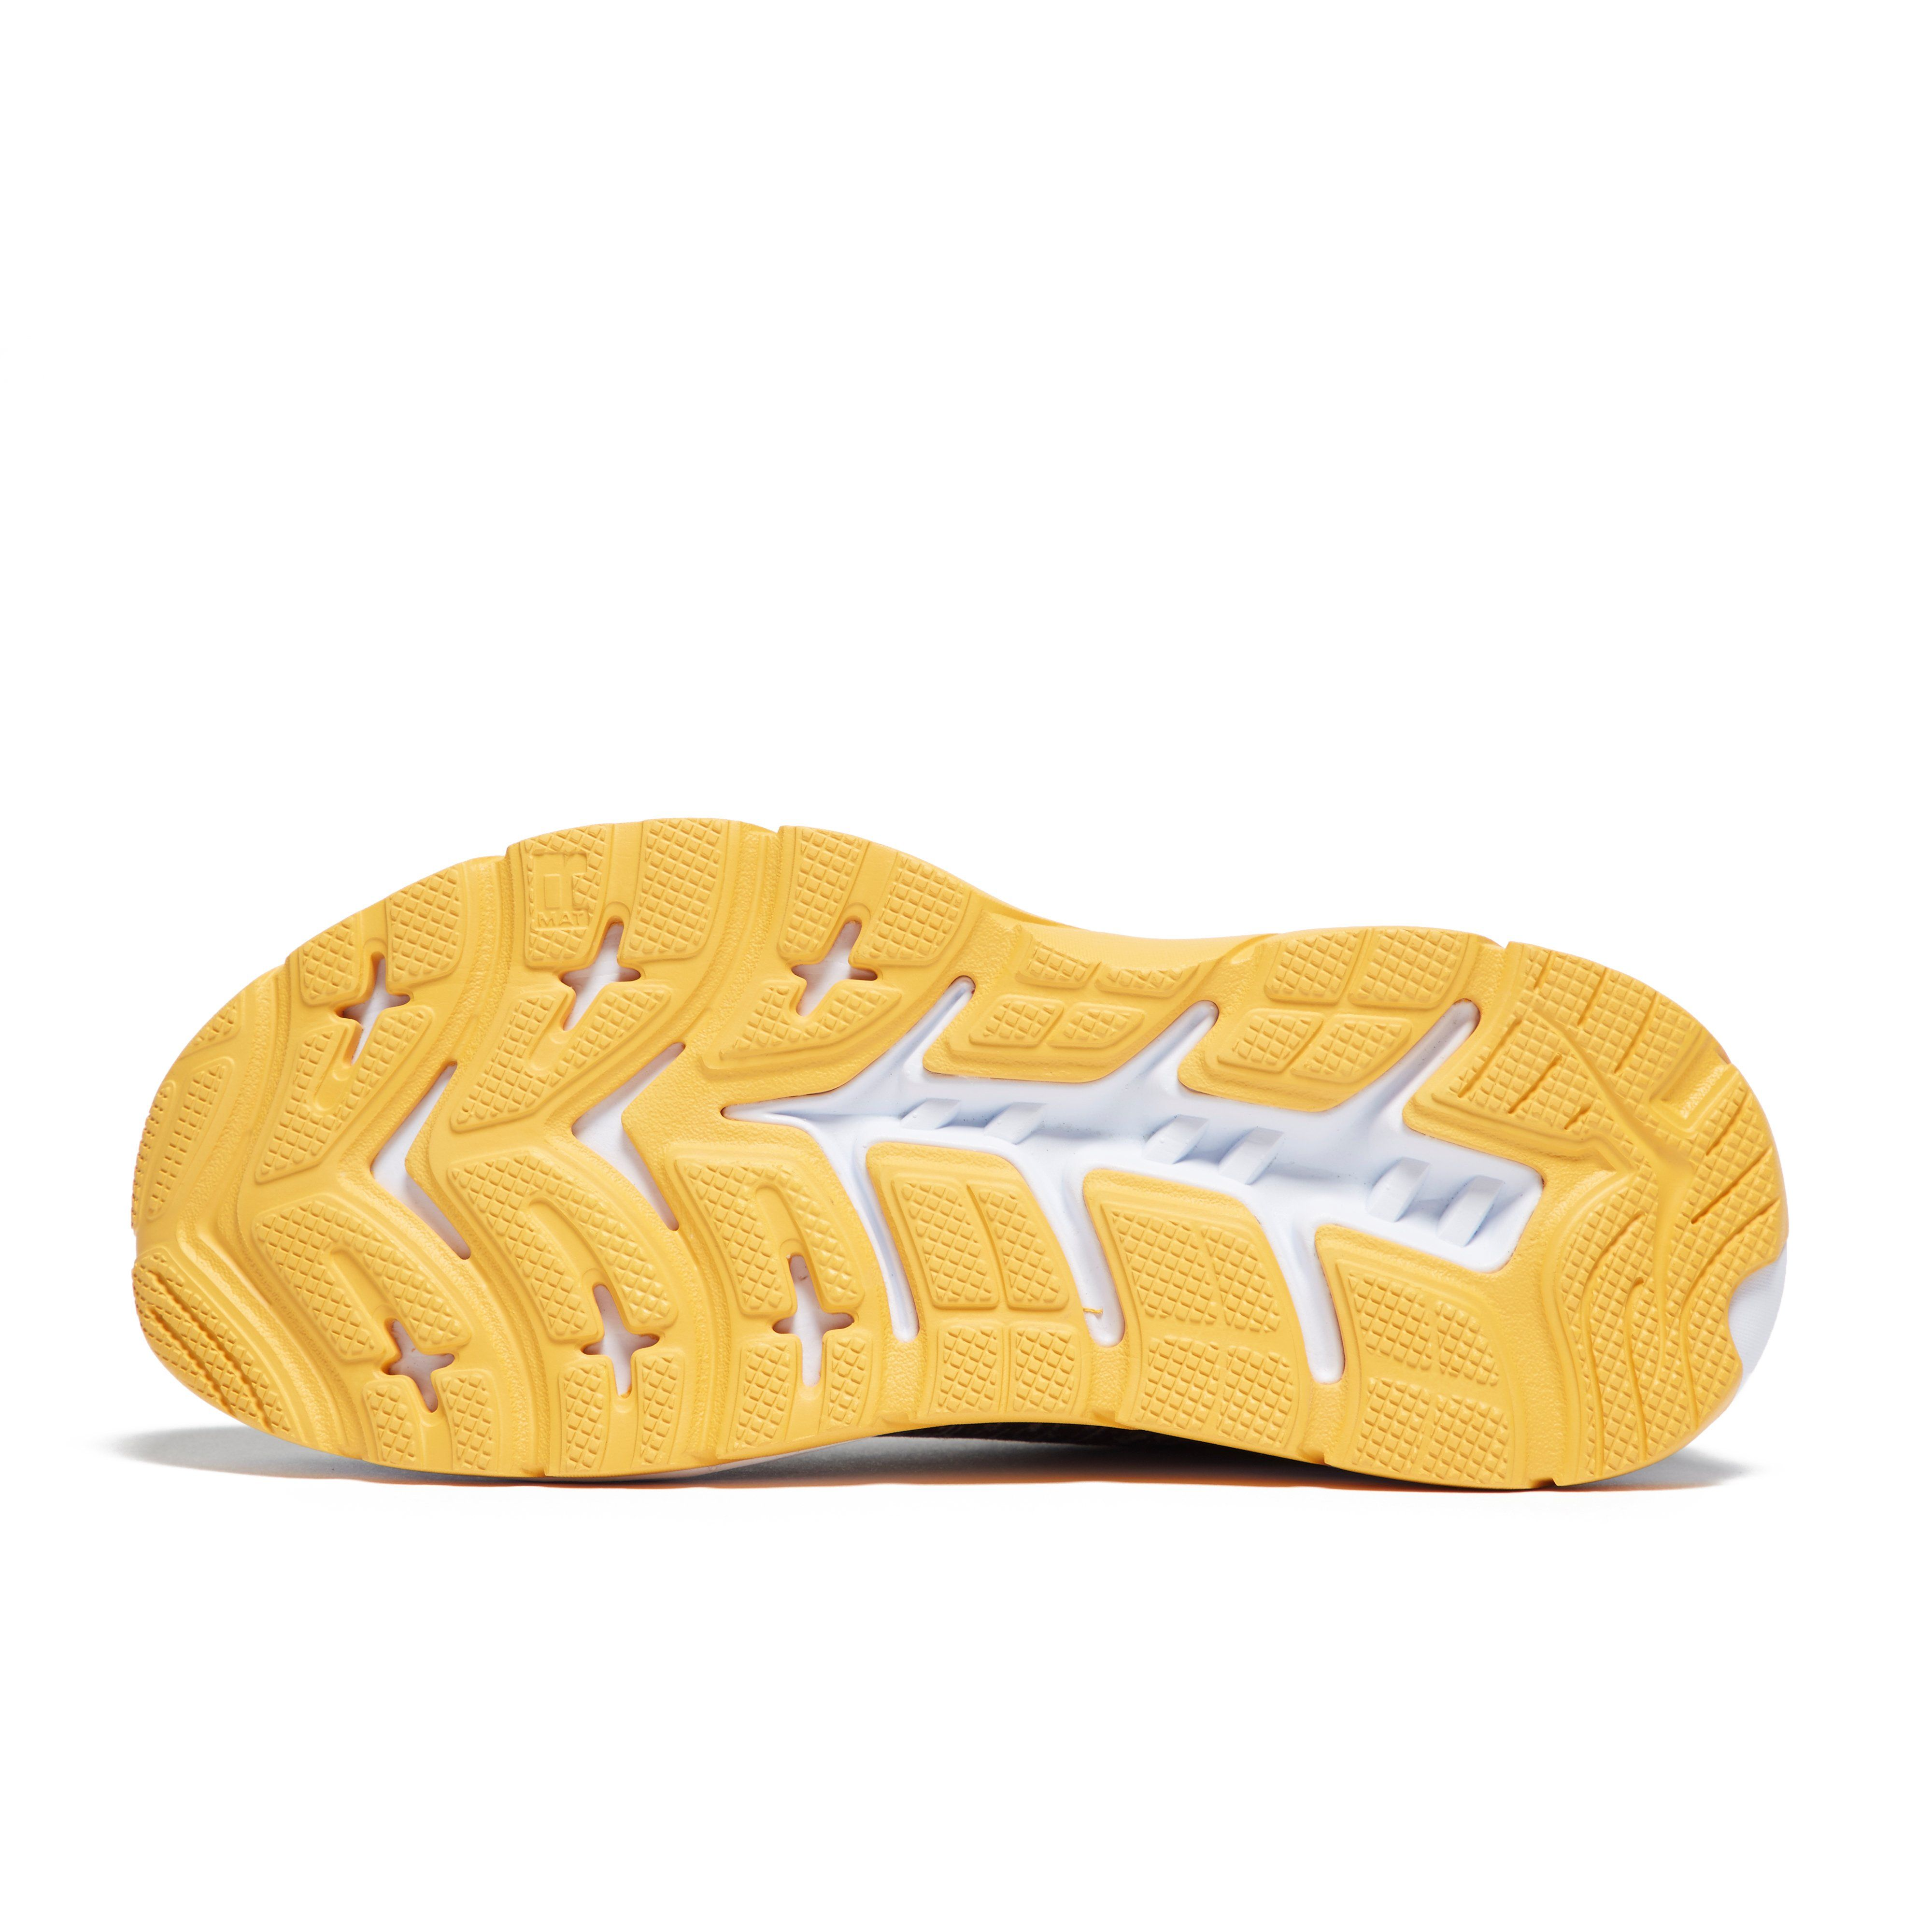 Hoka One One MACH Men's Running Shoes